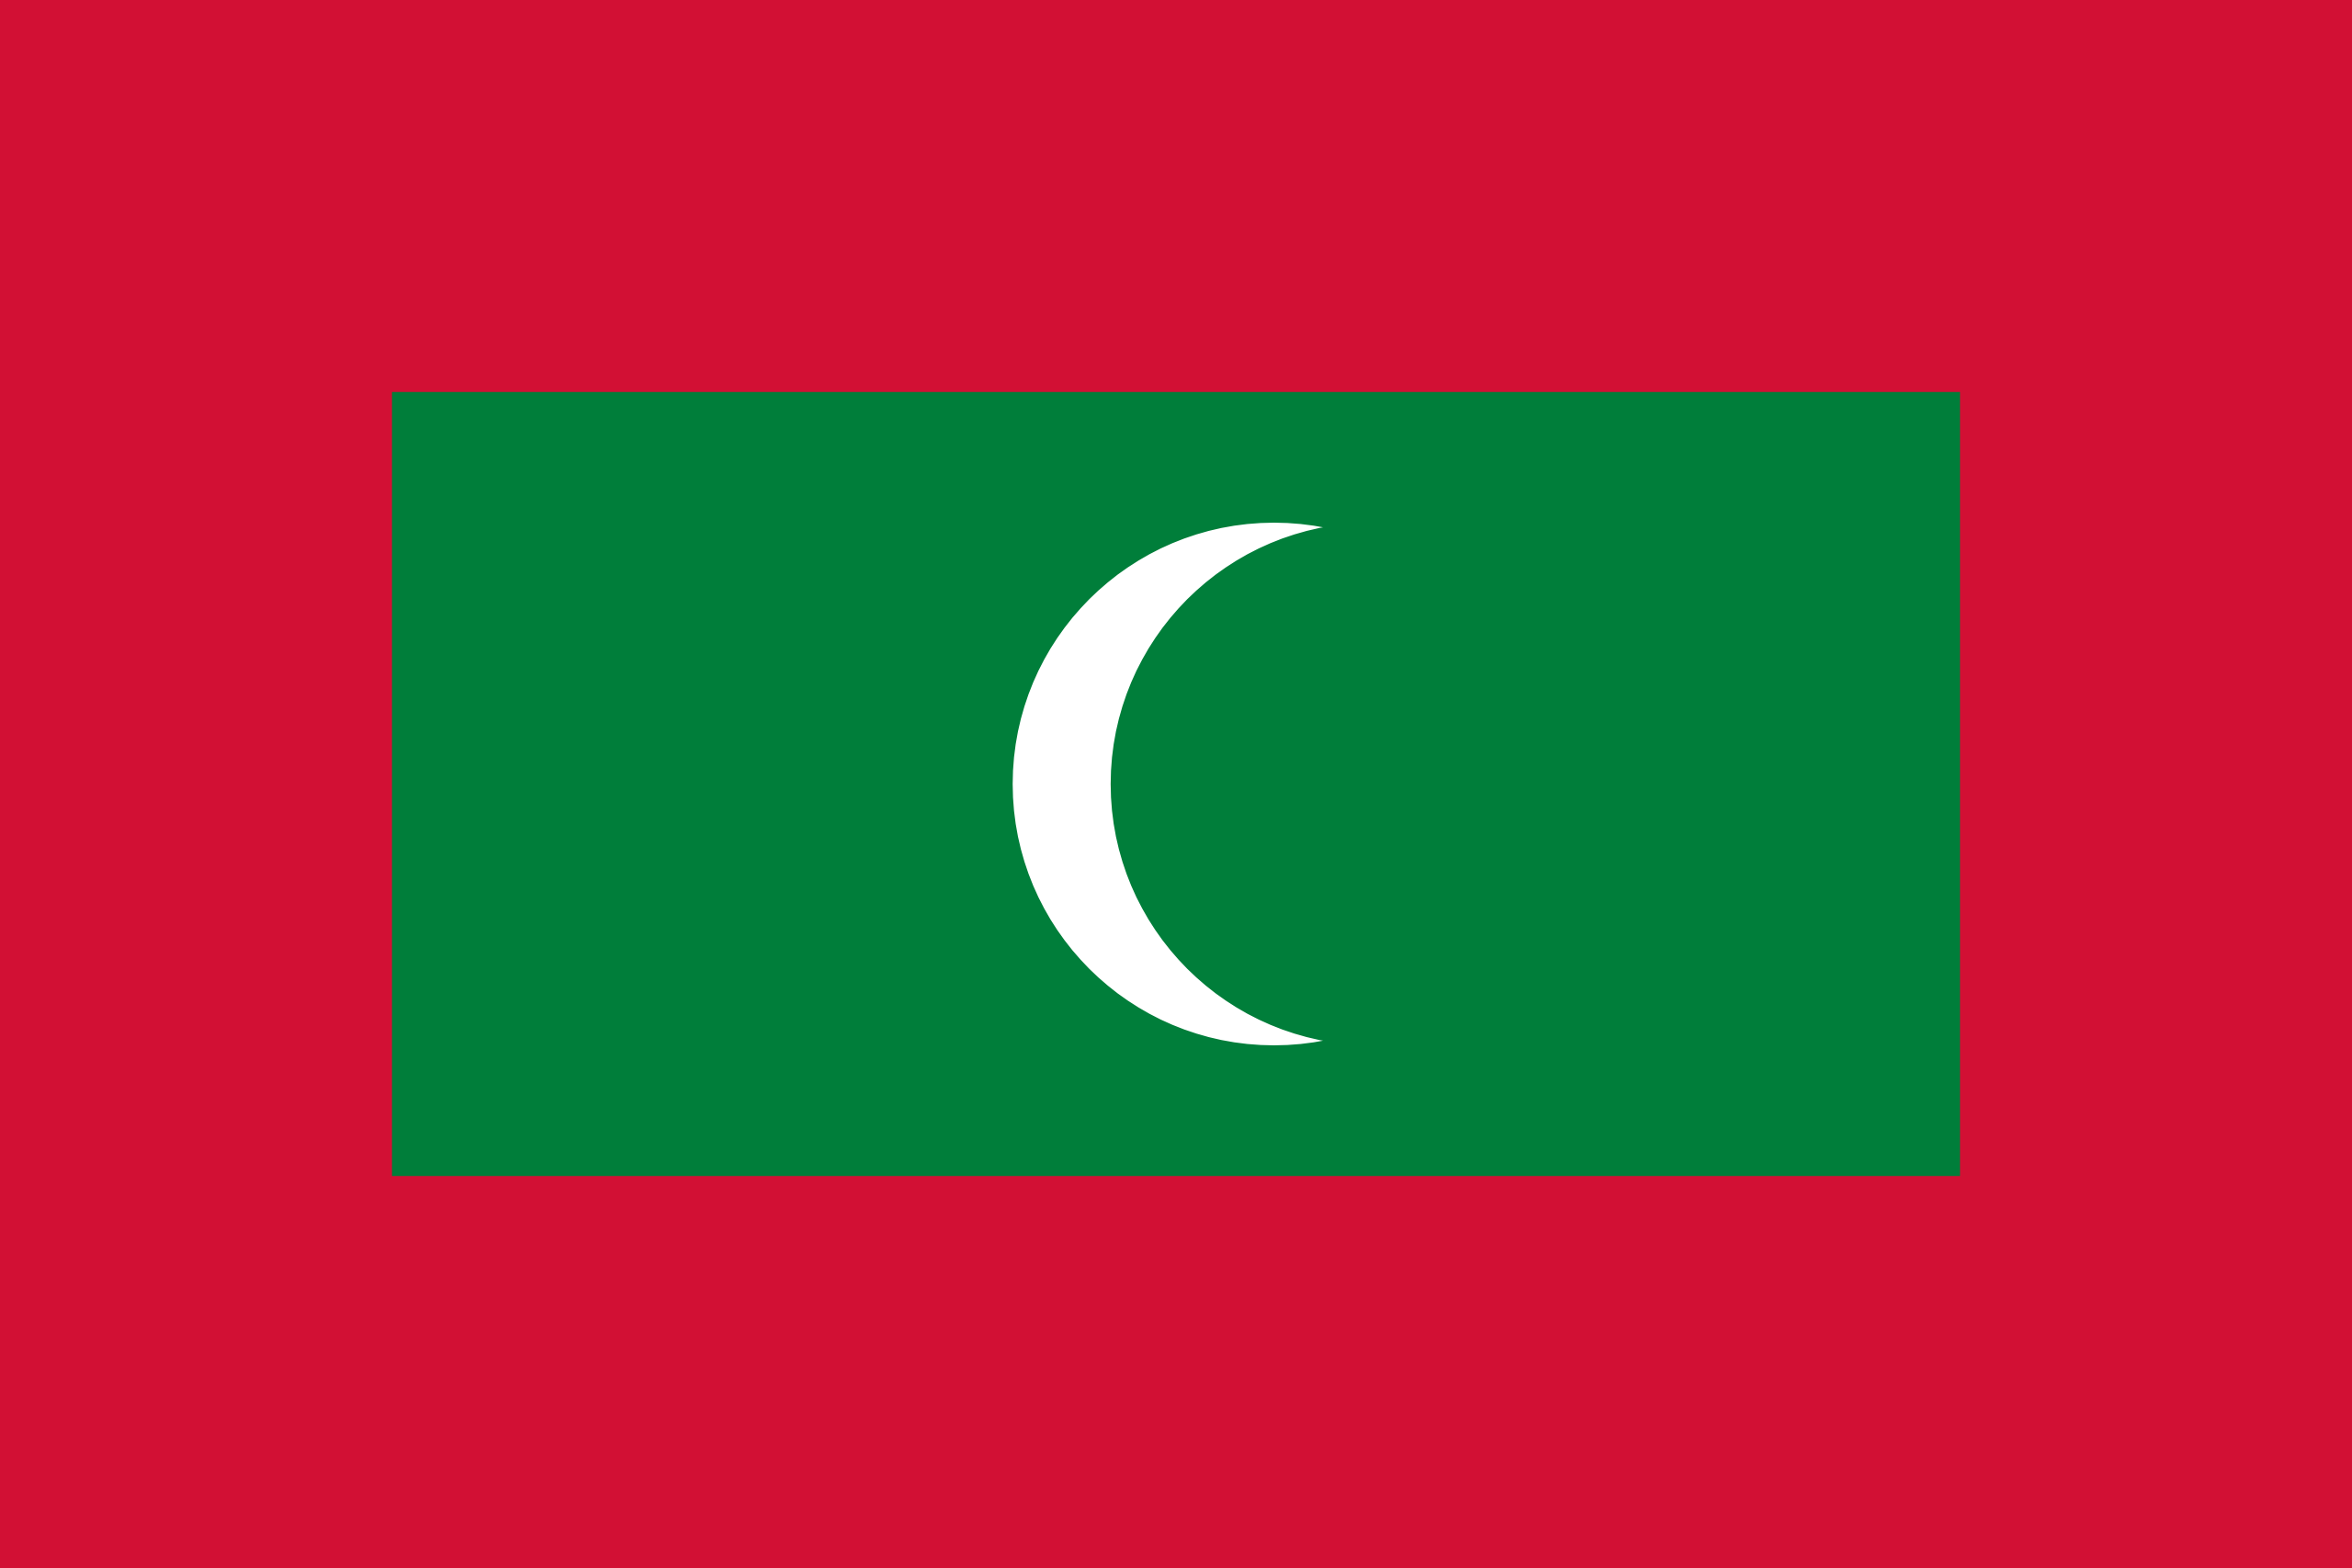 Maldive, paese, emblema, logo, simbolo - Sfondi HD - Professor-falken.com